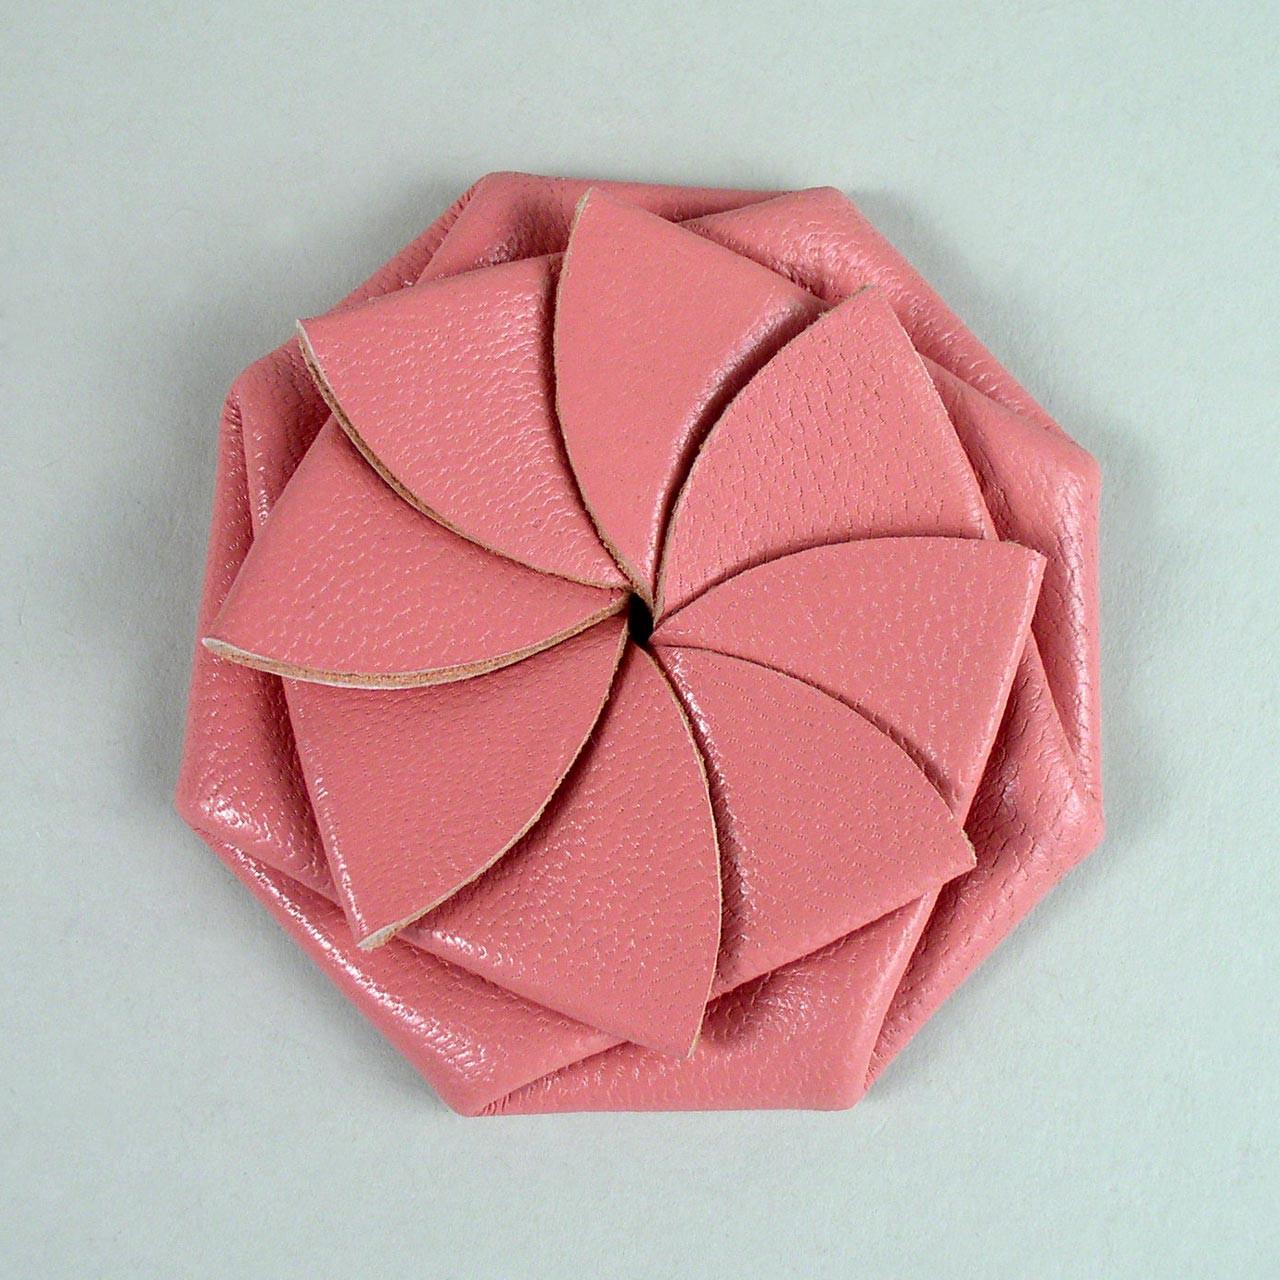 Manchuen Hui 許文泉 - Origami Coin Purse Slims Your Pocket. | 1280x1280